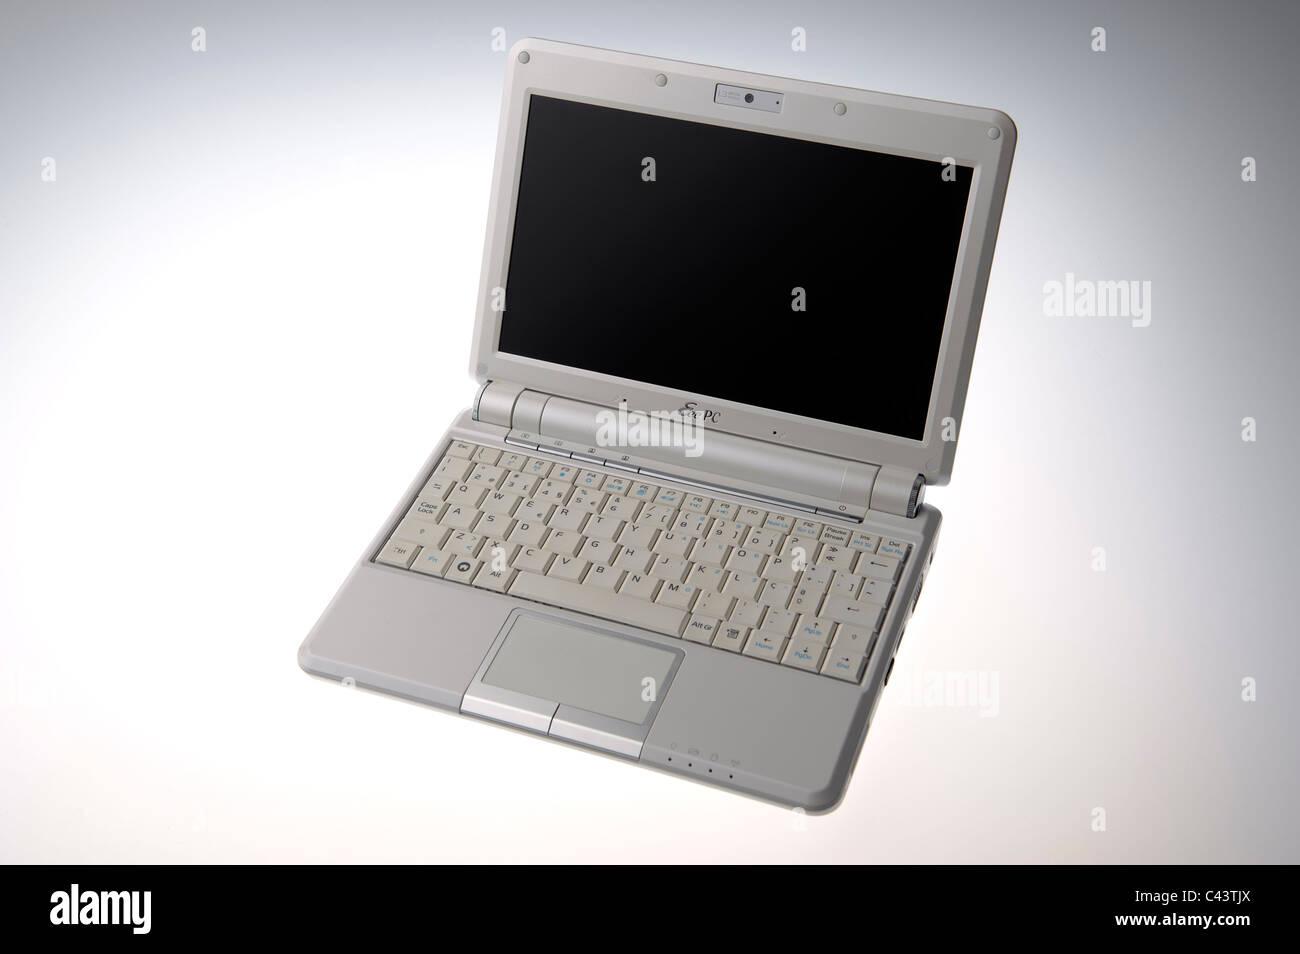 White Asus EeePC 901 netbook computer - Stock Image